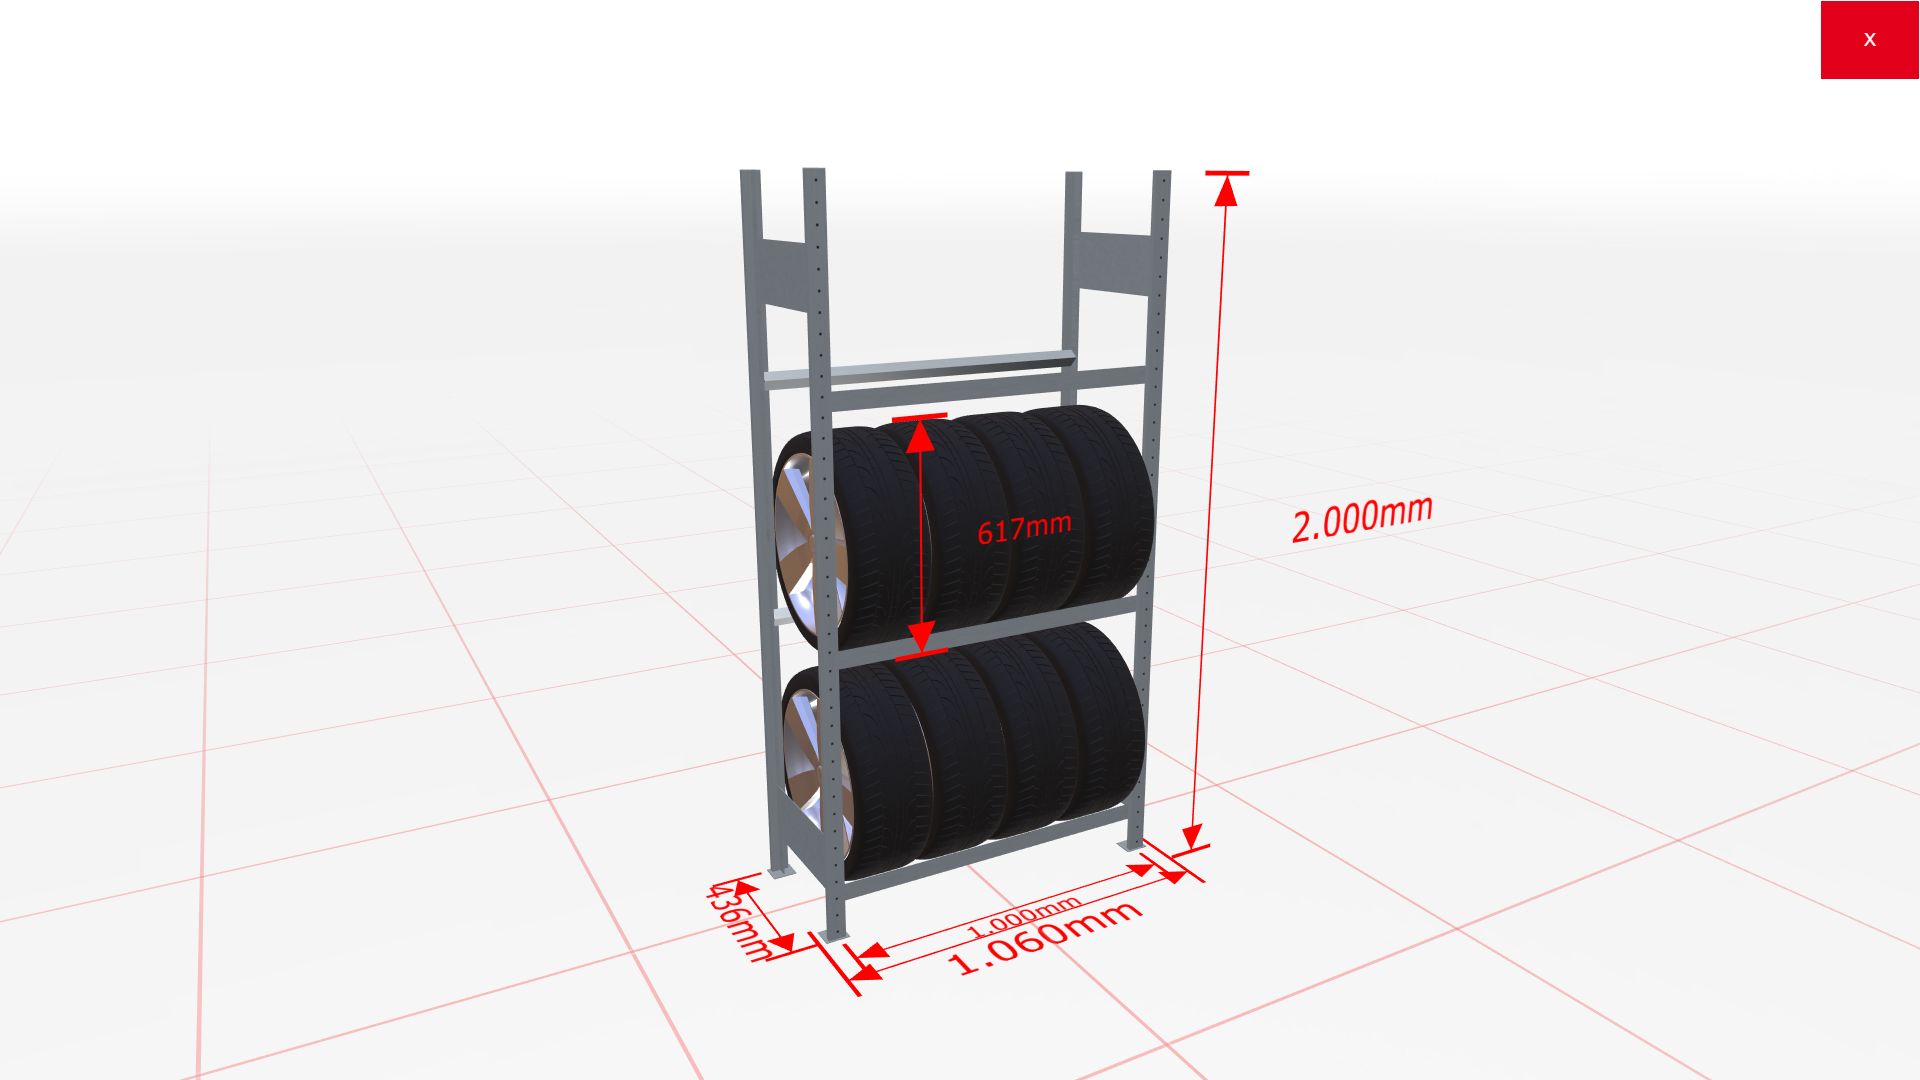 Räderregal Grundregal SCHULTE Lagertechnik 2000x1000x400 mm – 3 Ebenen á 1000 mm, verzinkt